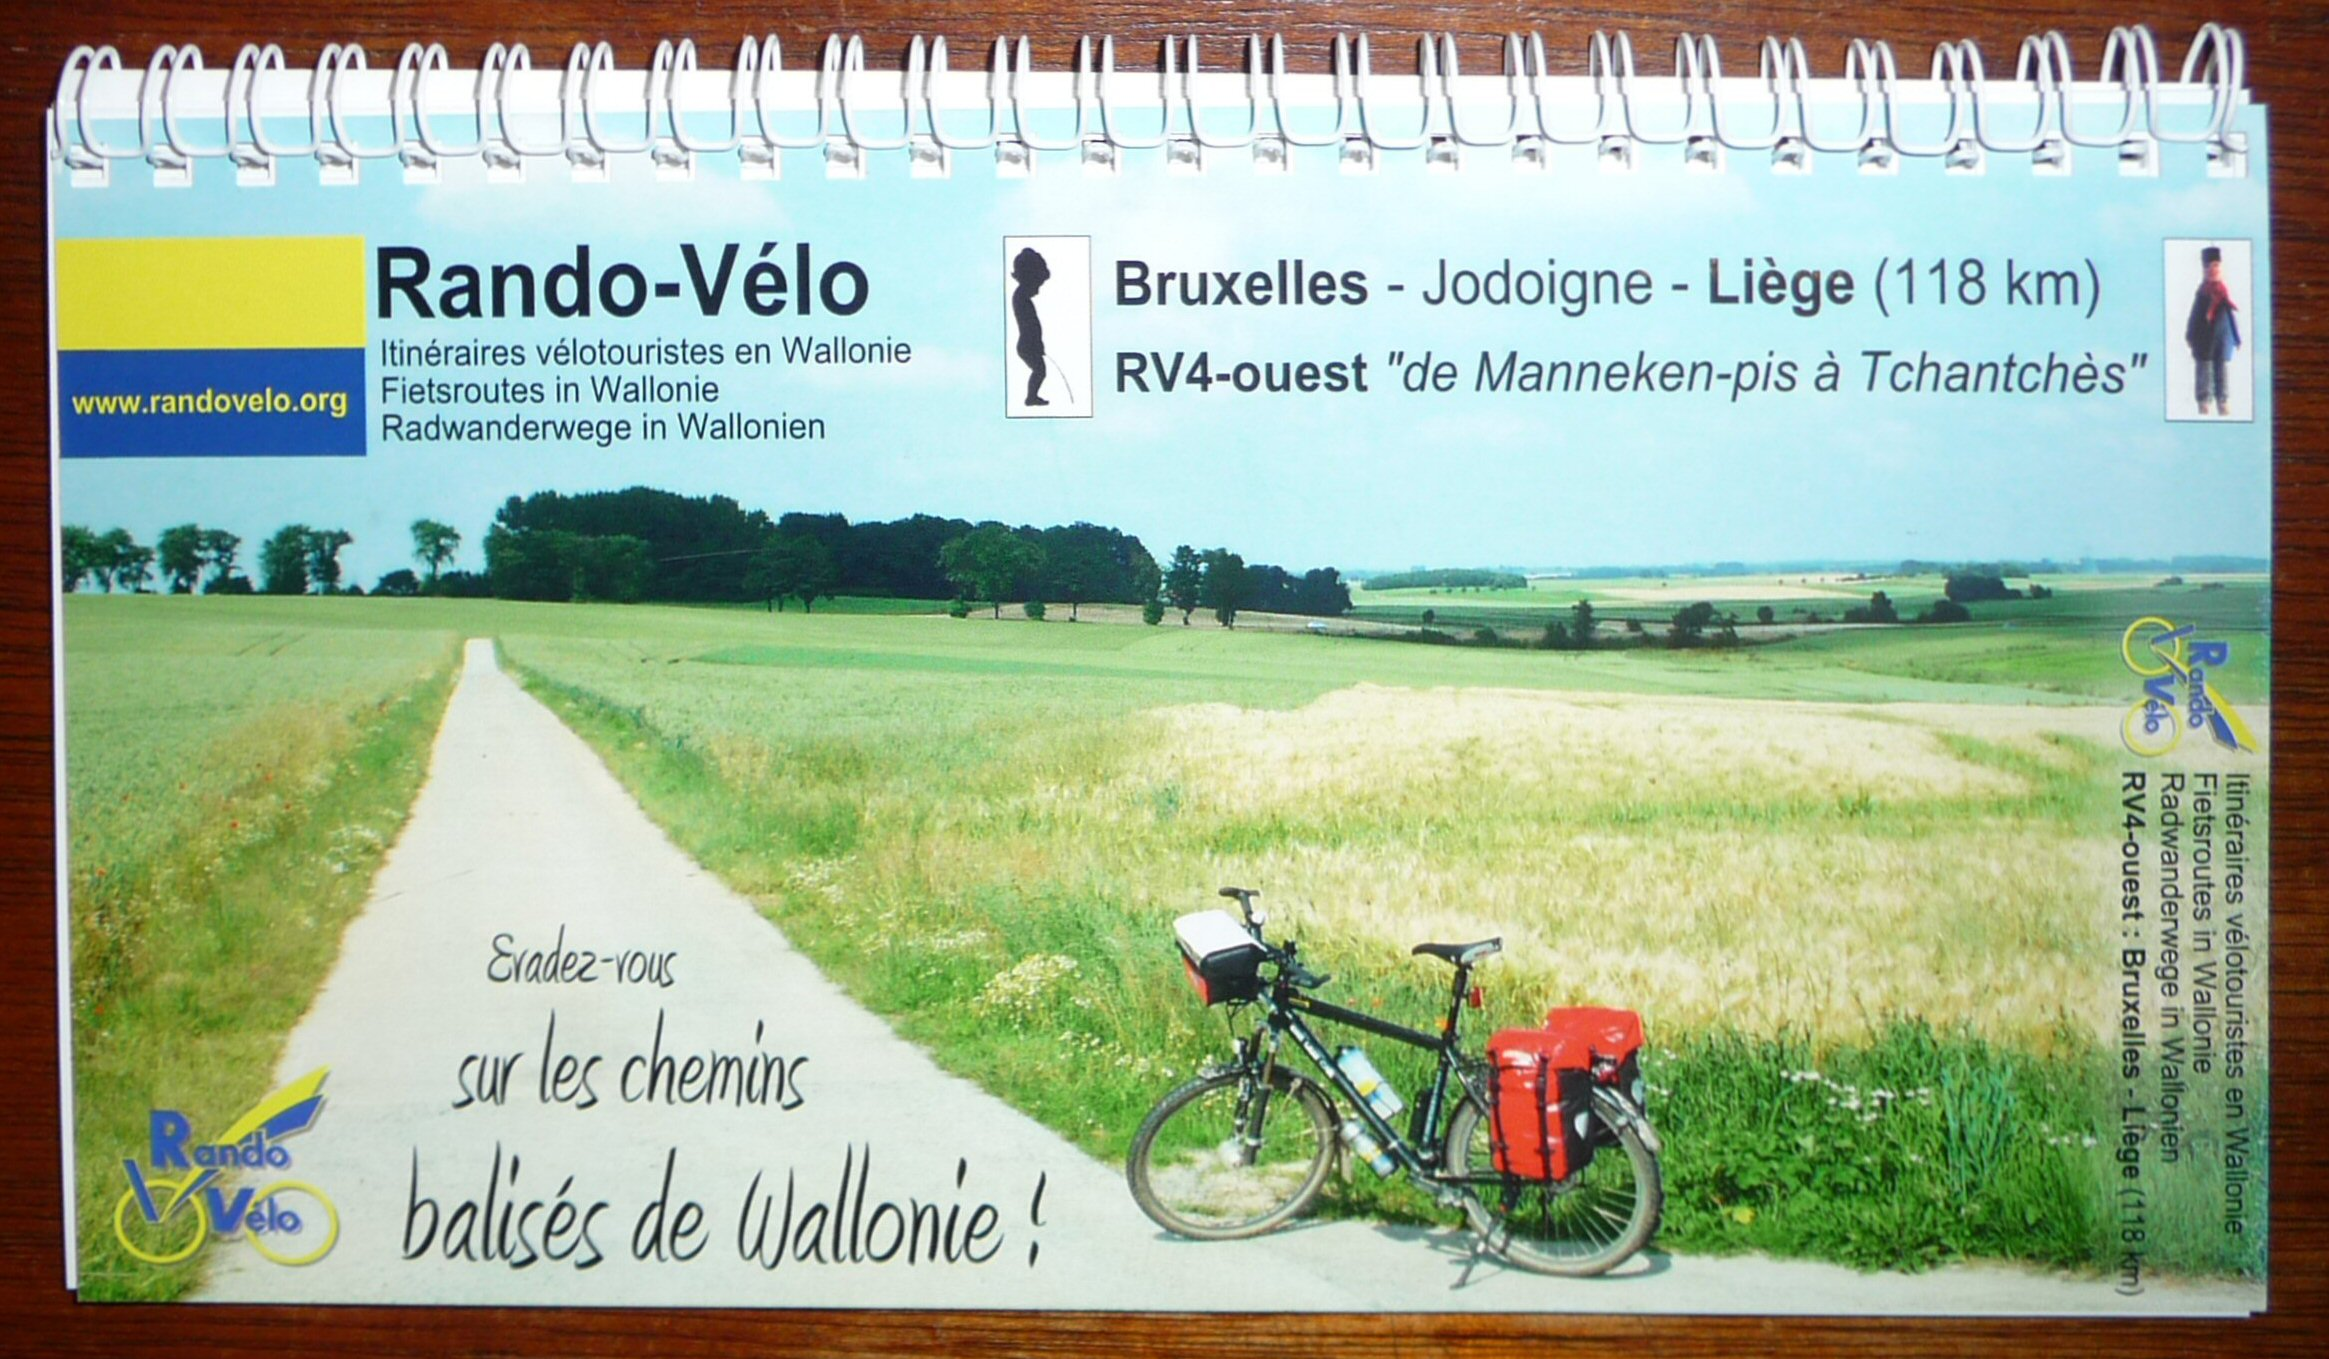 Fietsgids Rando-Velo RV 4 Brussel - Luik   Randovelo